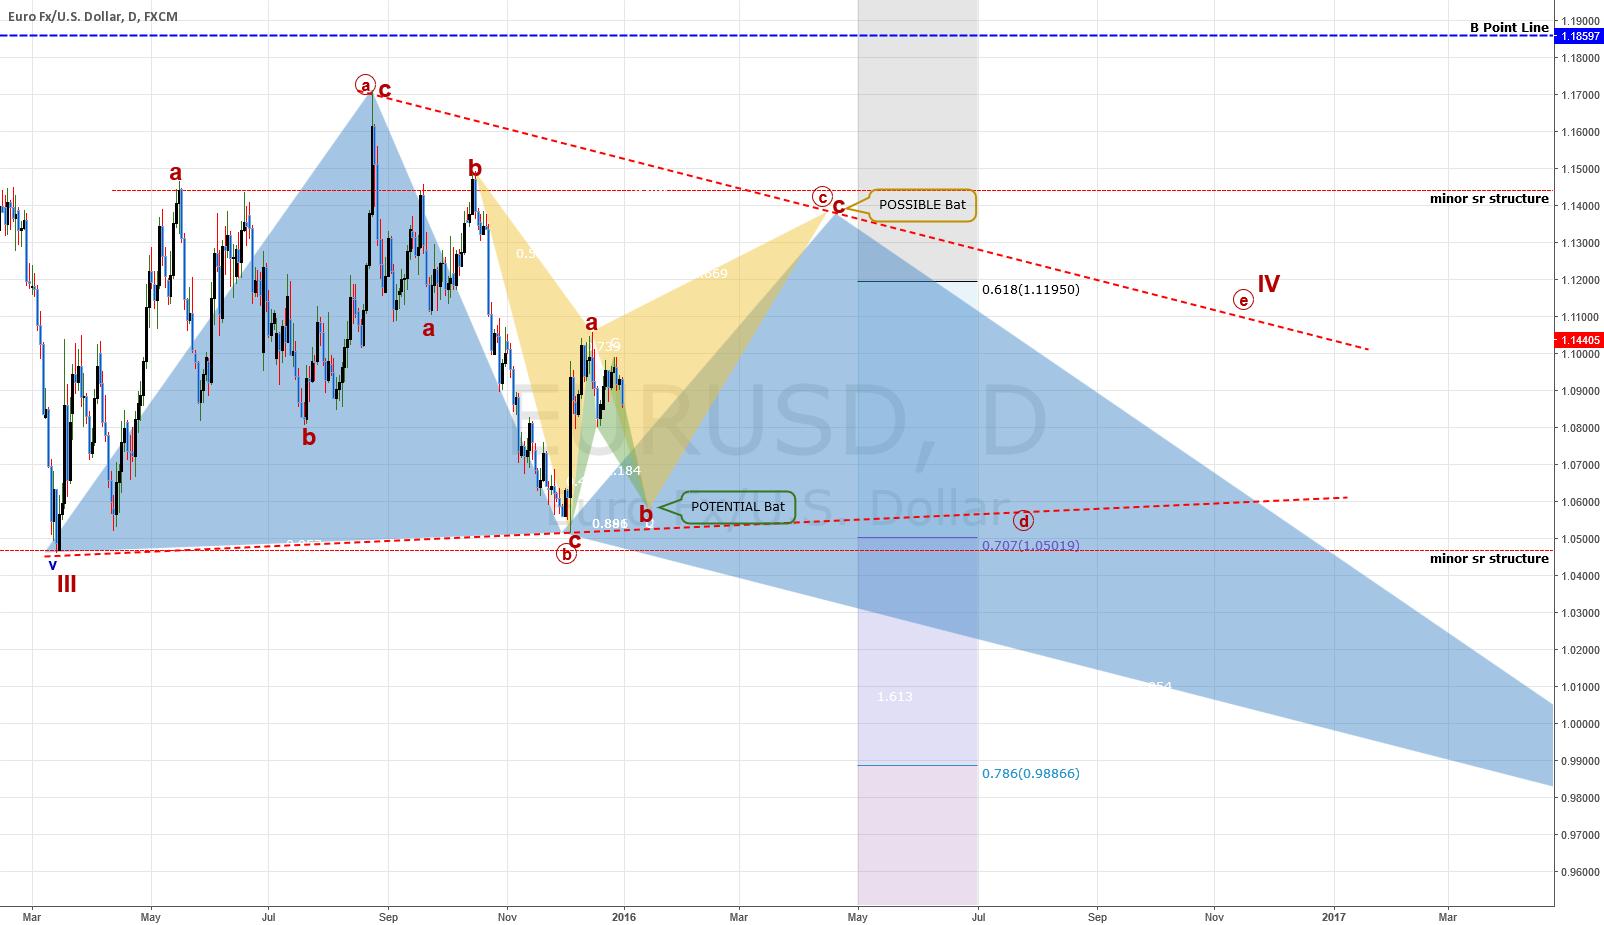 (I) DAILY Chart: EURUSD: Forming A Triangle?